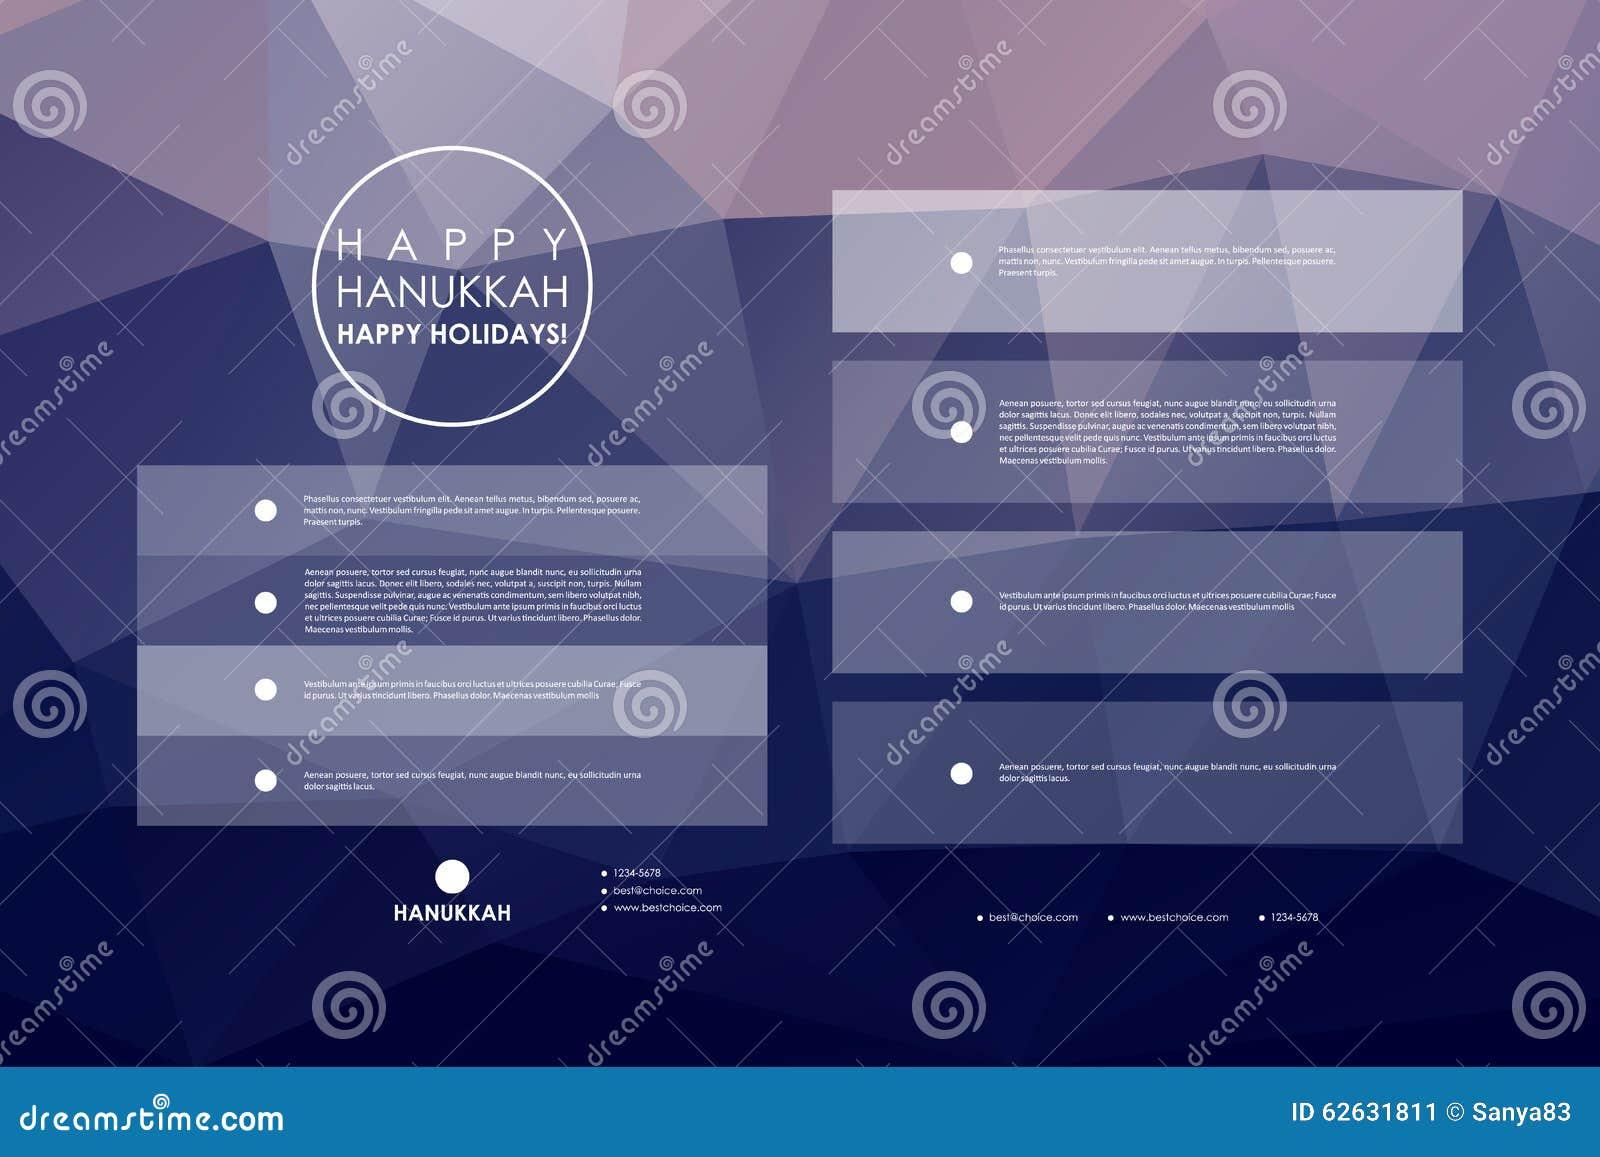 Set of brochure, poster design templates in